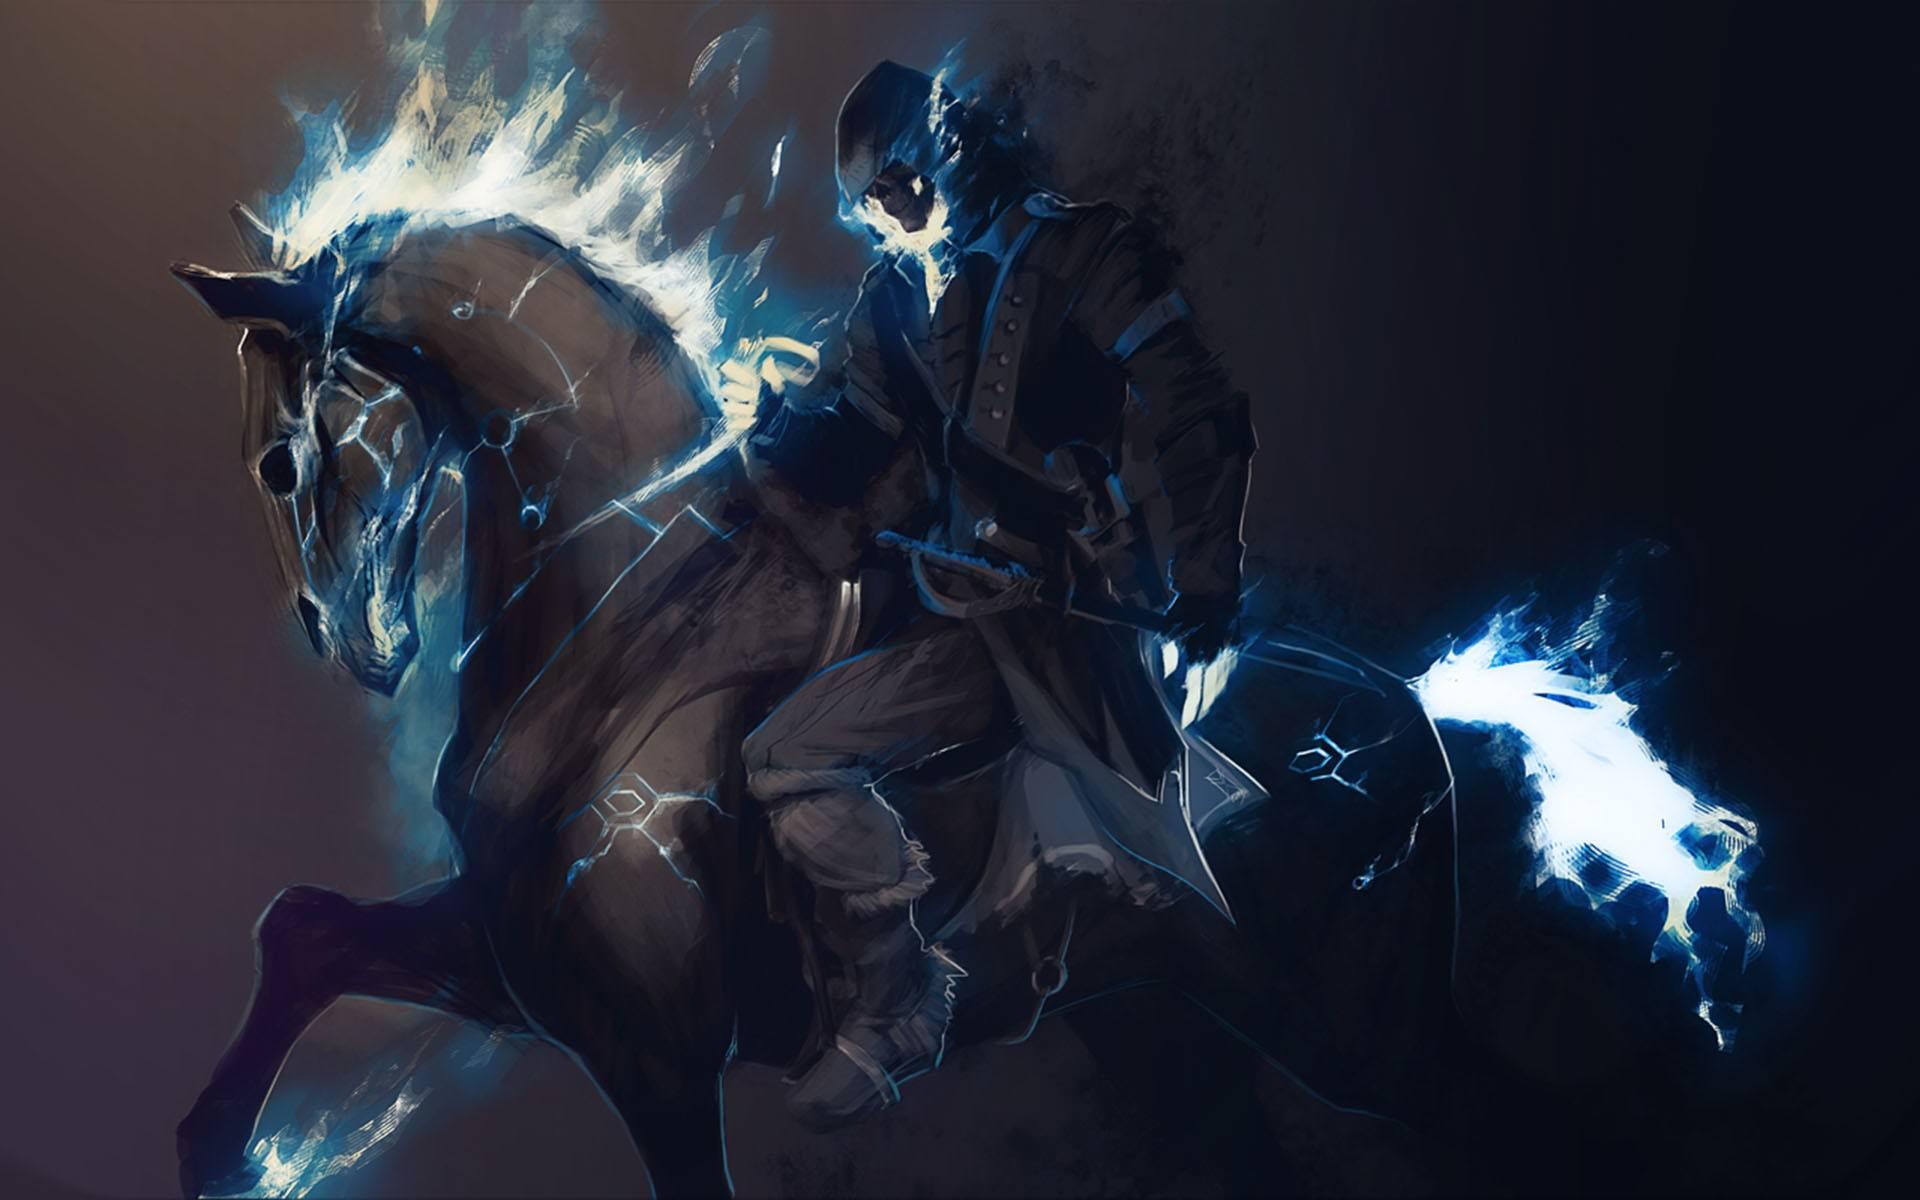 wallpaper horse fantasy painting digital fire 1920x1200 1920x1200